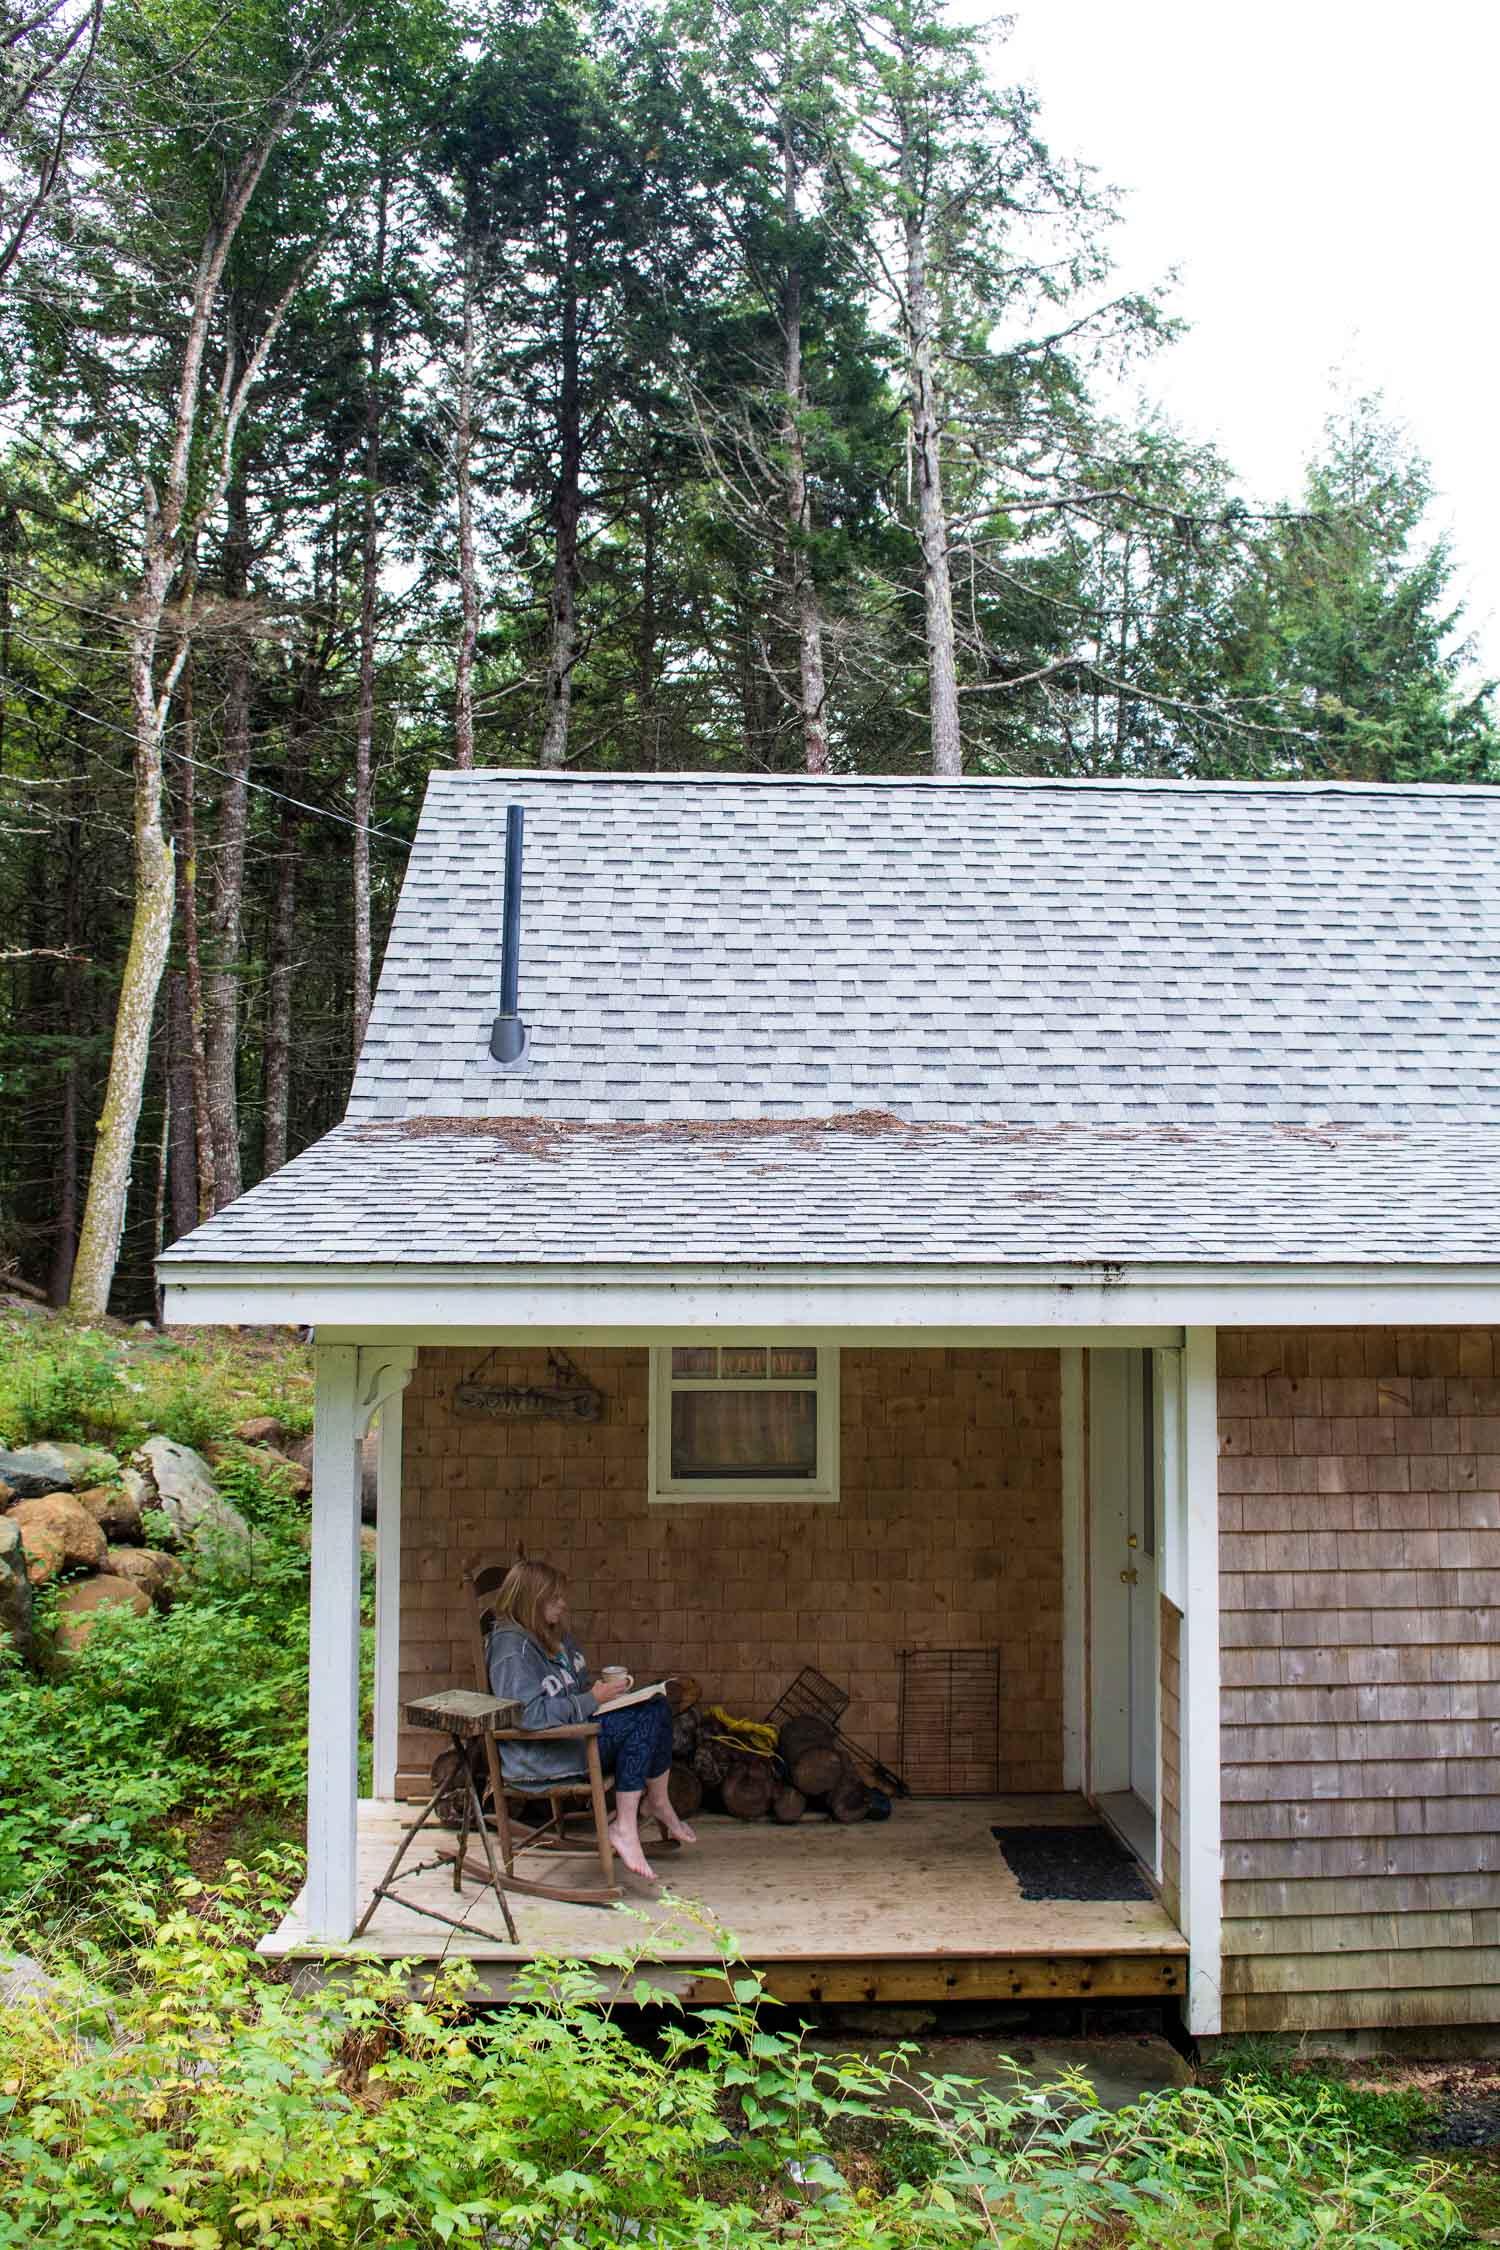 sept08 2013-Cottage Life-Smulders family-Moelga Lake NS-photo by Aaron McKenzie Fraser-www.amfraser.com-5471.jpg